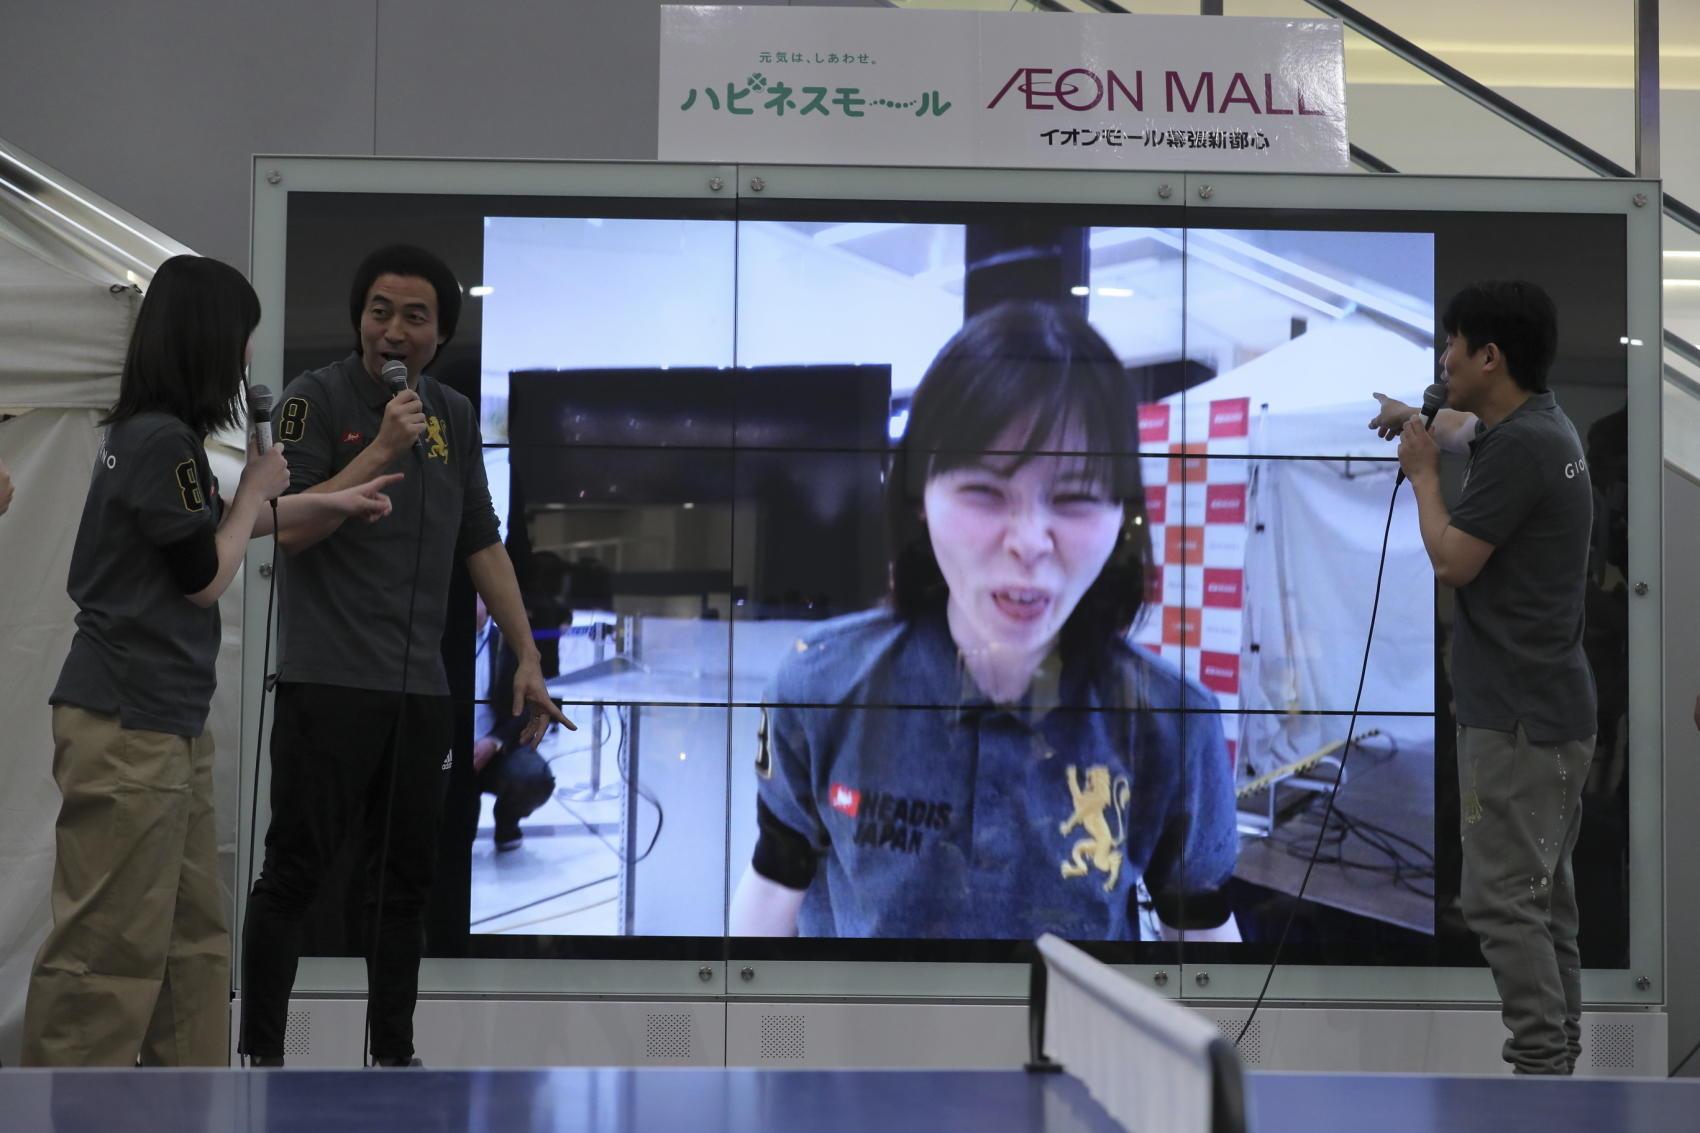 http://news.yoshimoto.co.jp/20180220173935-c4f961ff0764351dbc2f7060b7fd8881597533b9.jpg